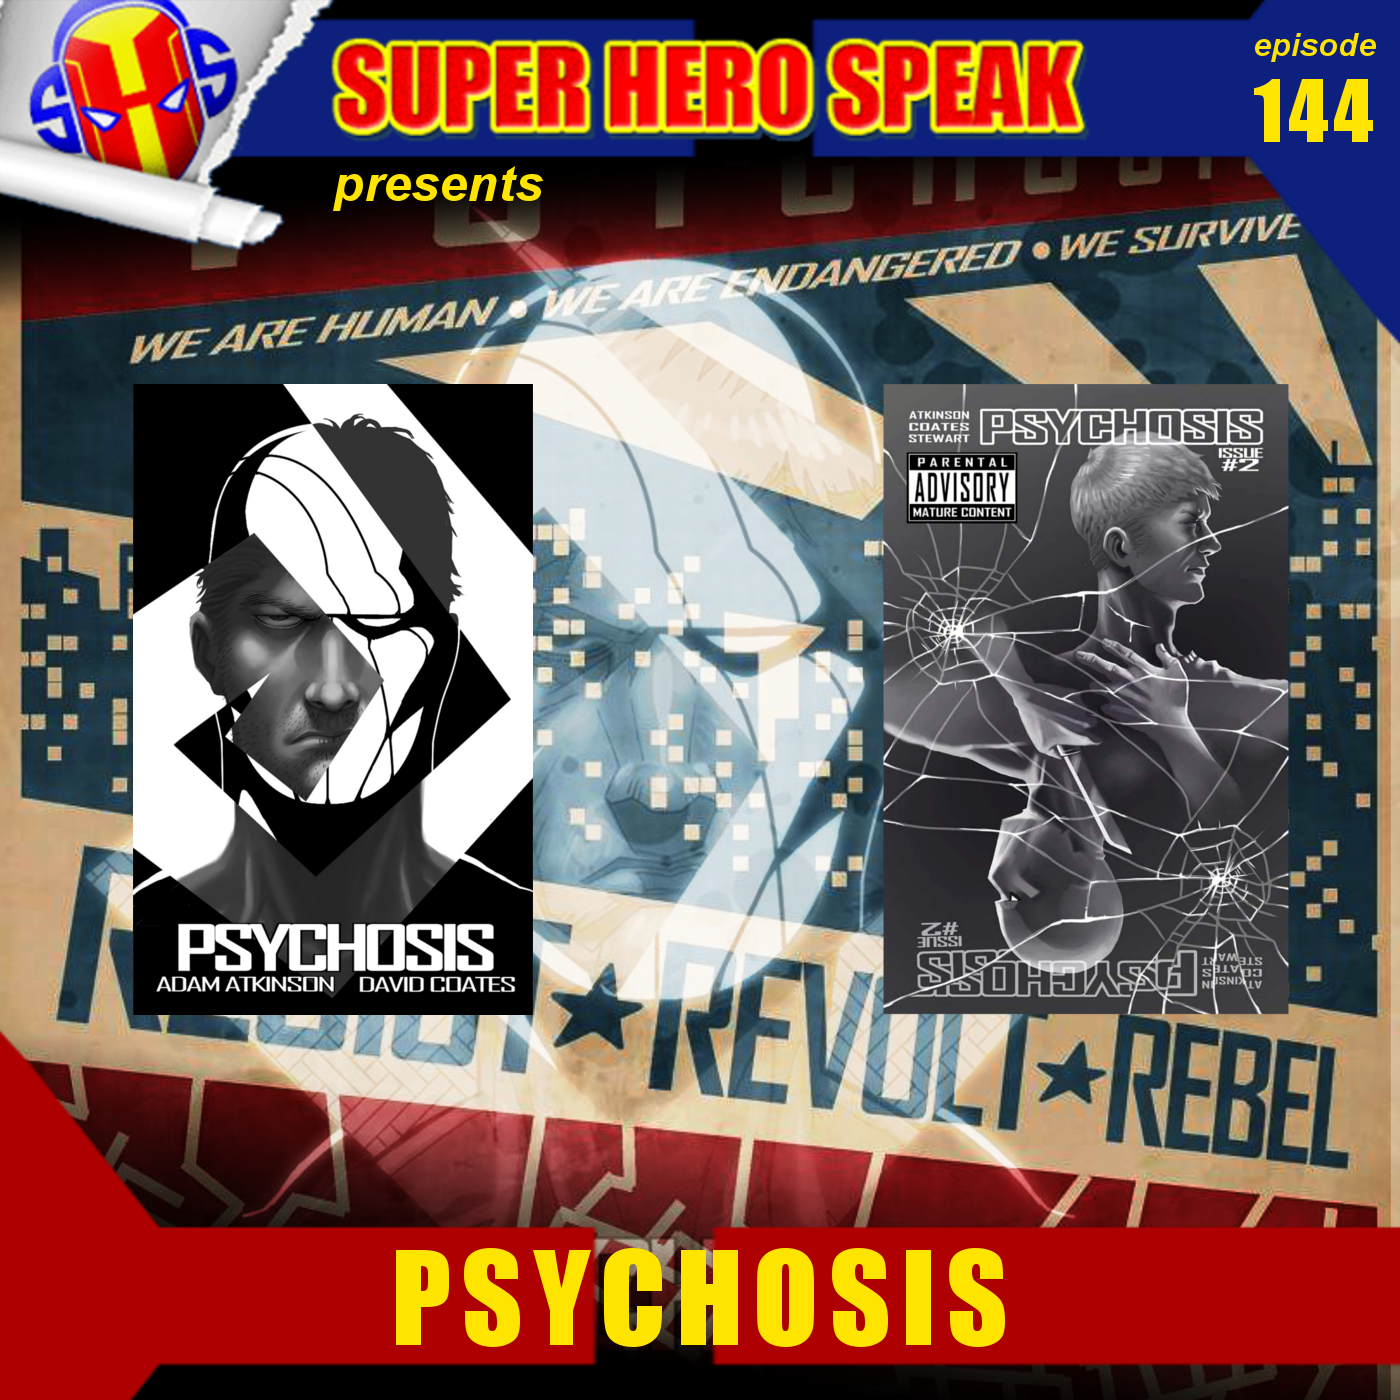 #144: Psychosis (David Coates)